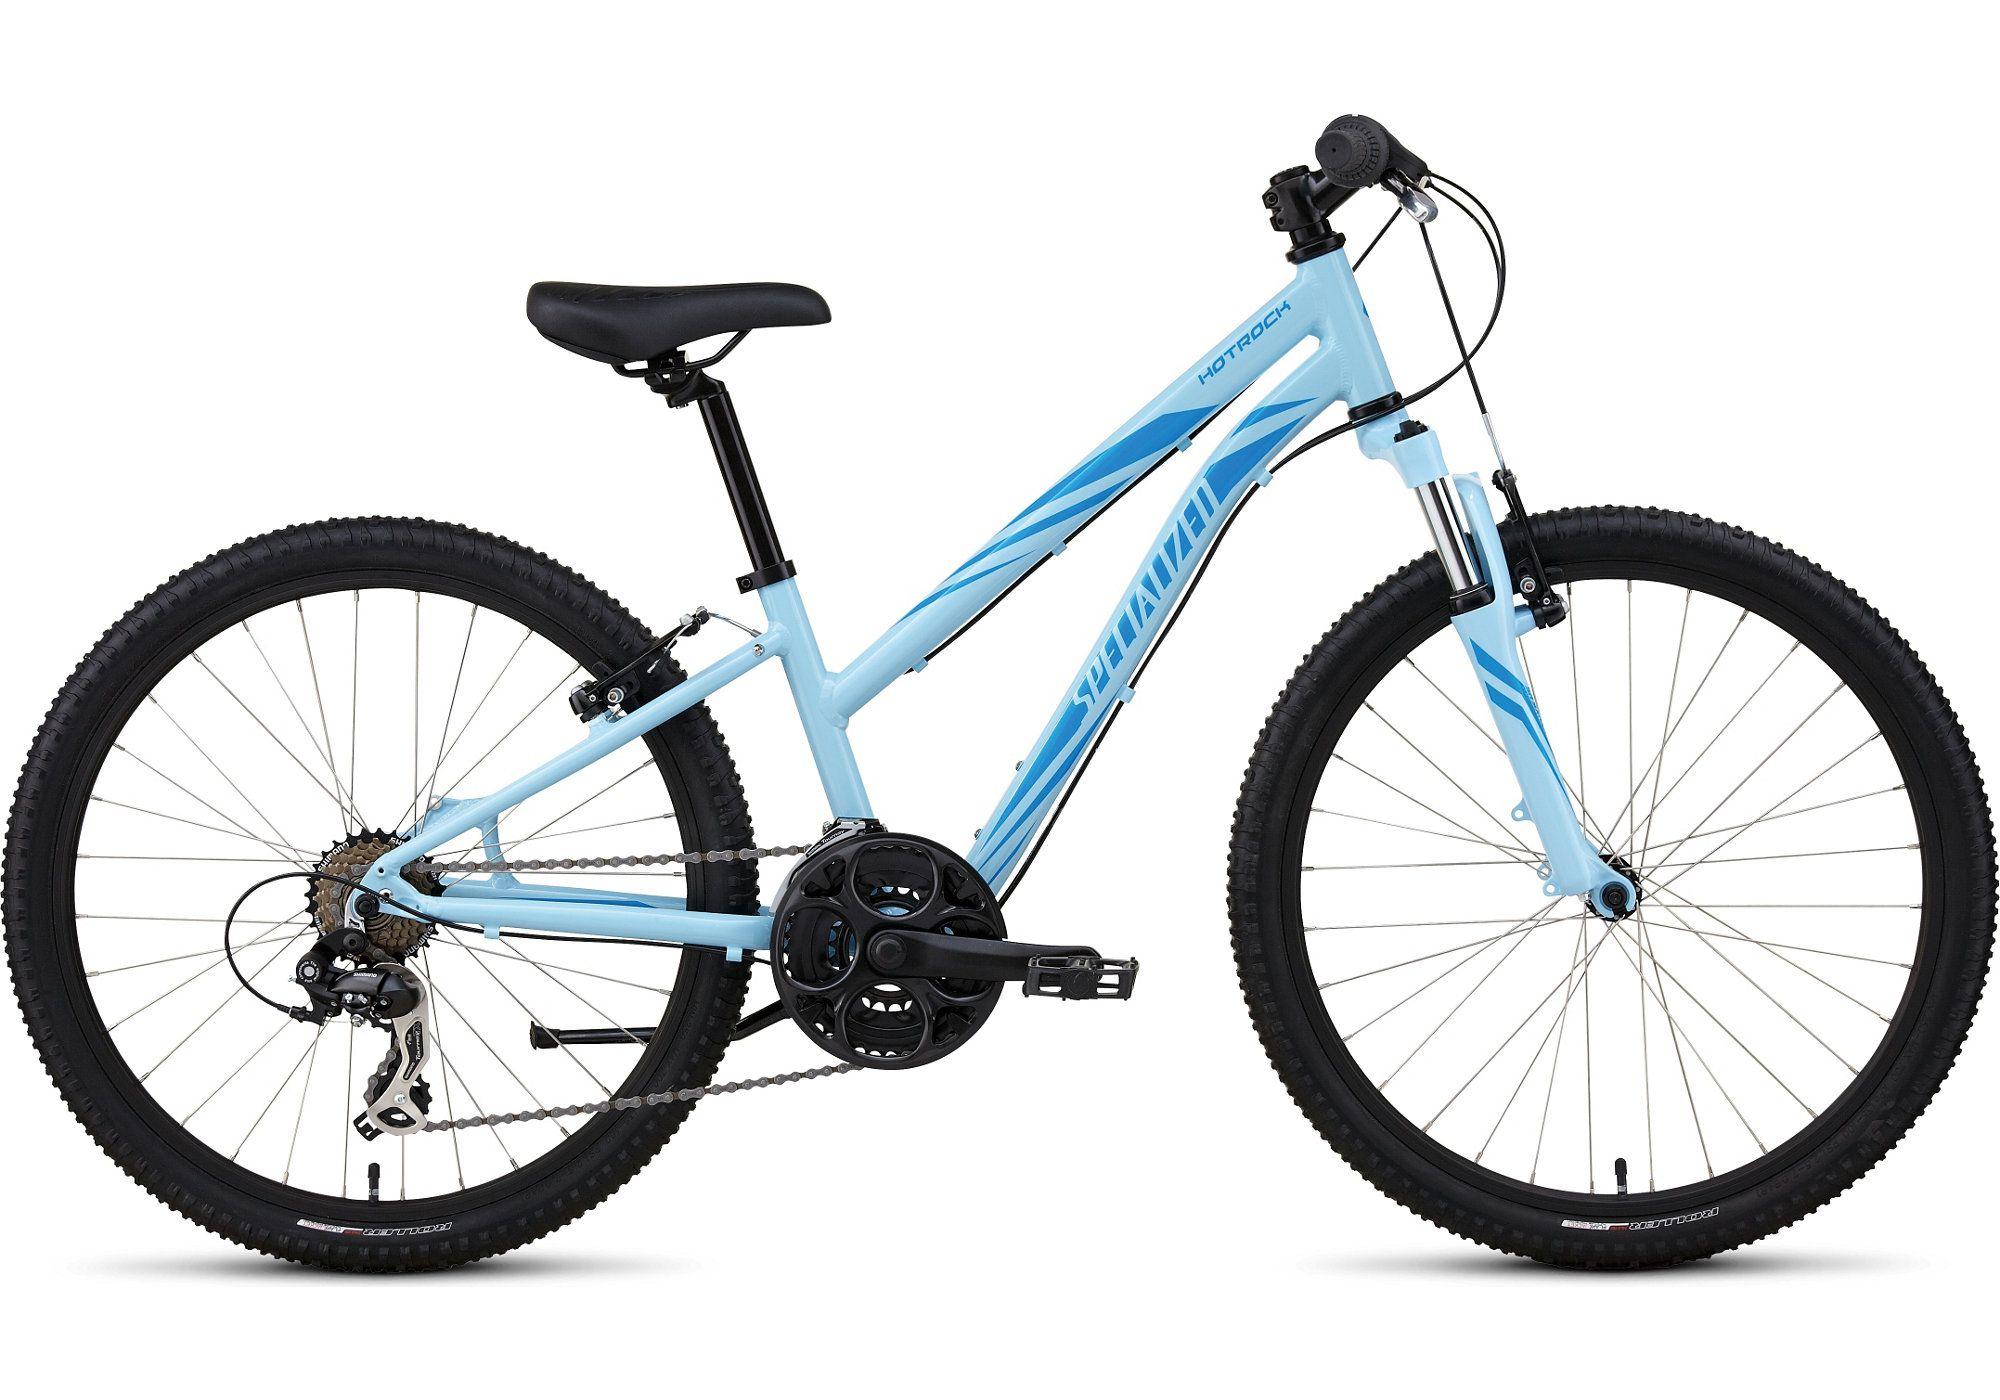 Велосипед Specialized Hotrock 24 21 speed girl 2016 велосипед specialized hotrock 20 6 speed boys 2016